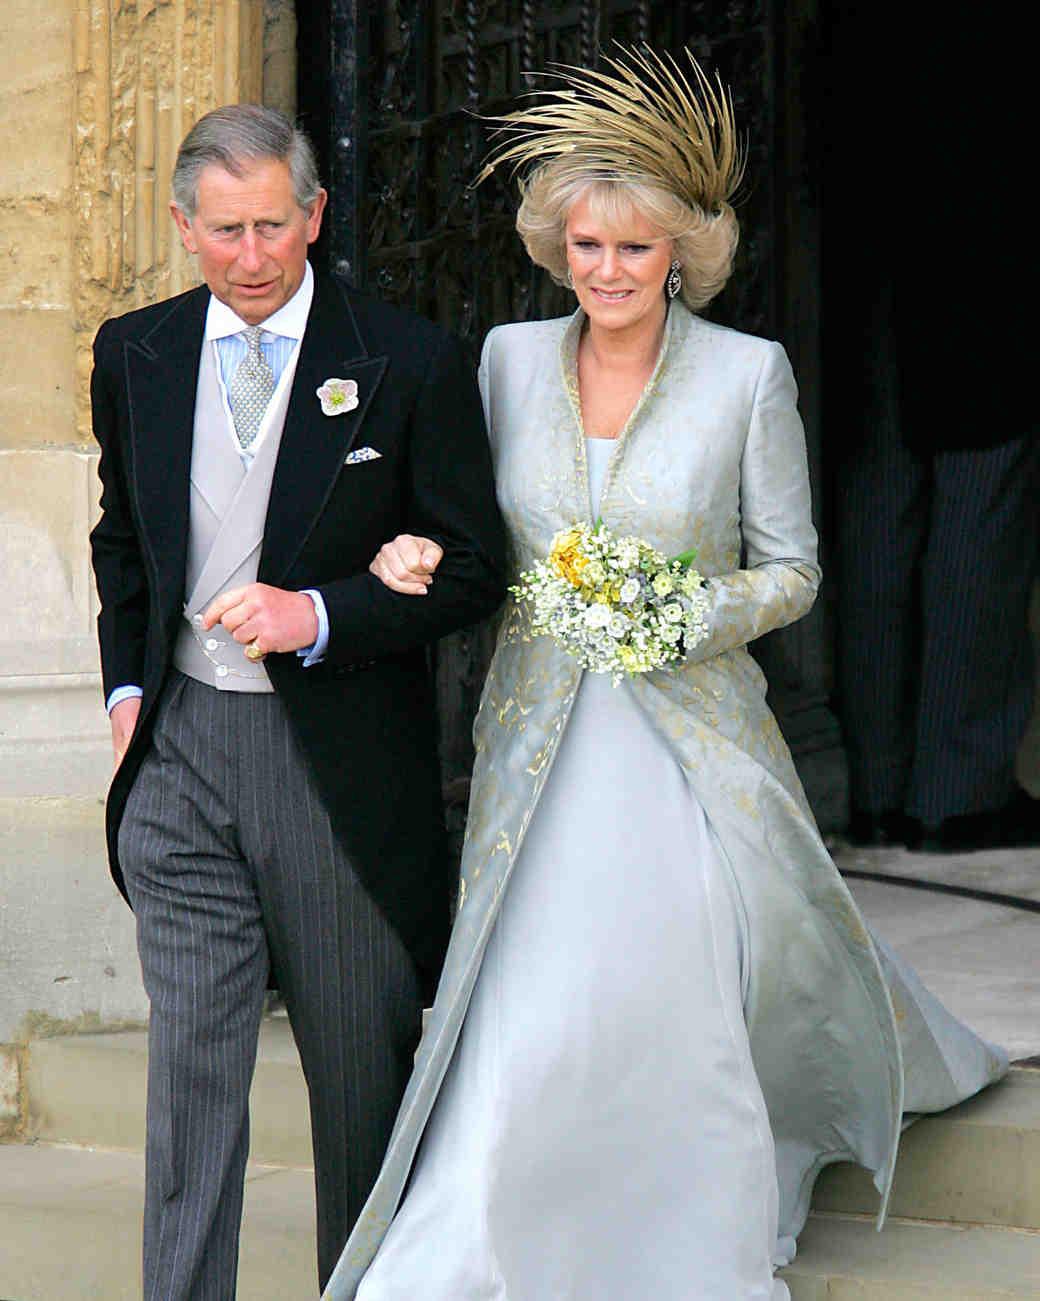 Свадебное платье иКамиллы, герцогини Корнуолл